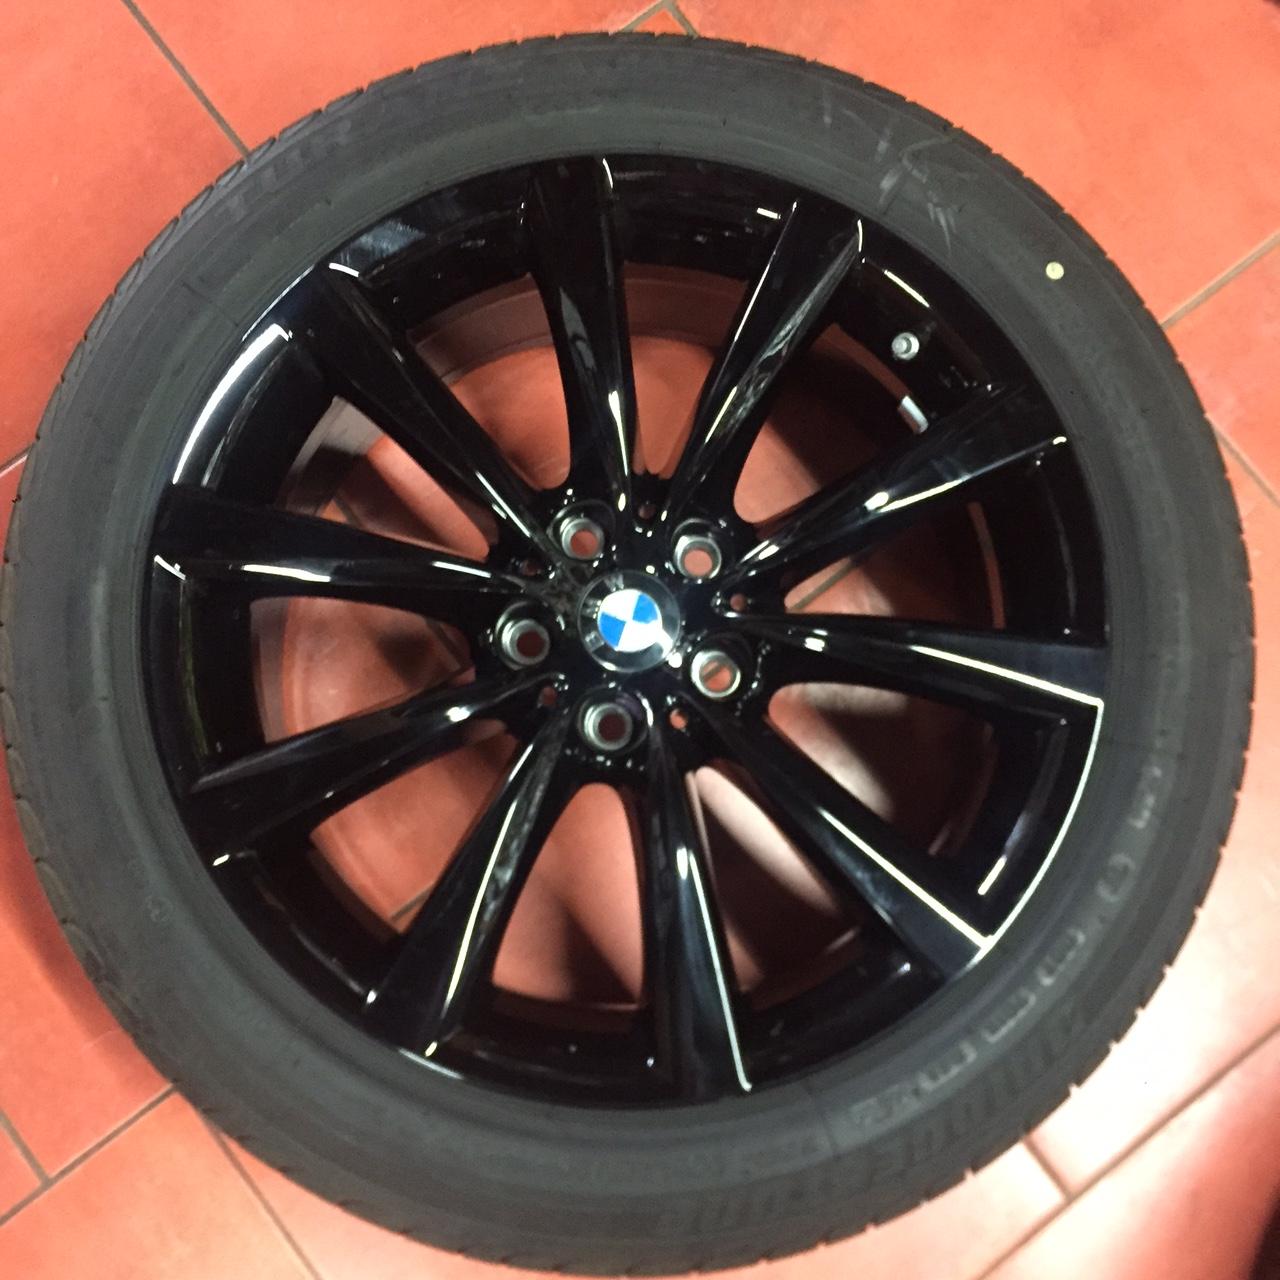 Originální alu kola BMW 5 G30 STYLING 642 8x18 ET30 s pneumatikou 245/45 R18 96Y